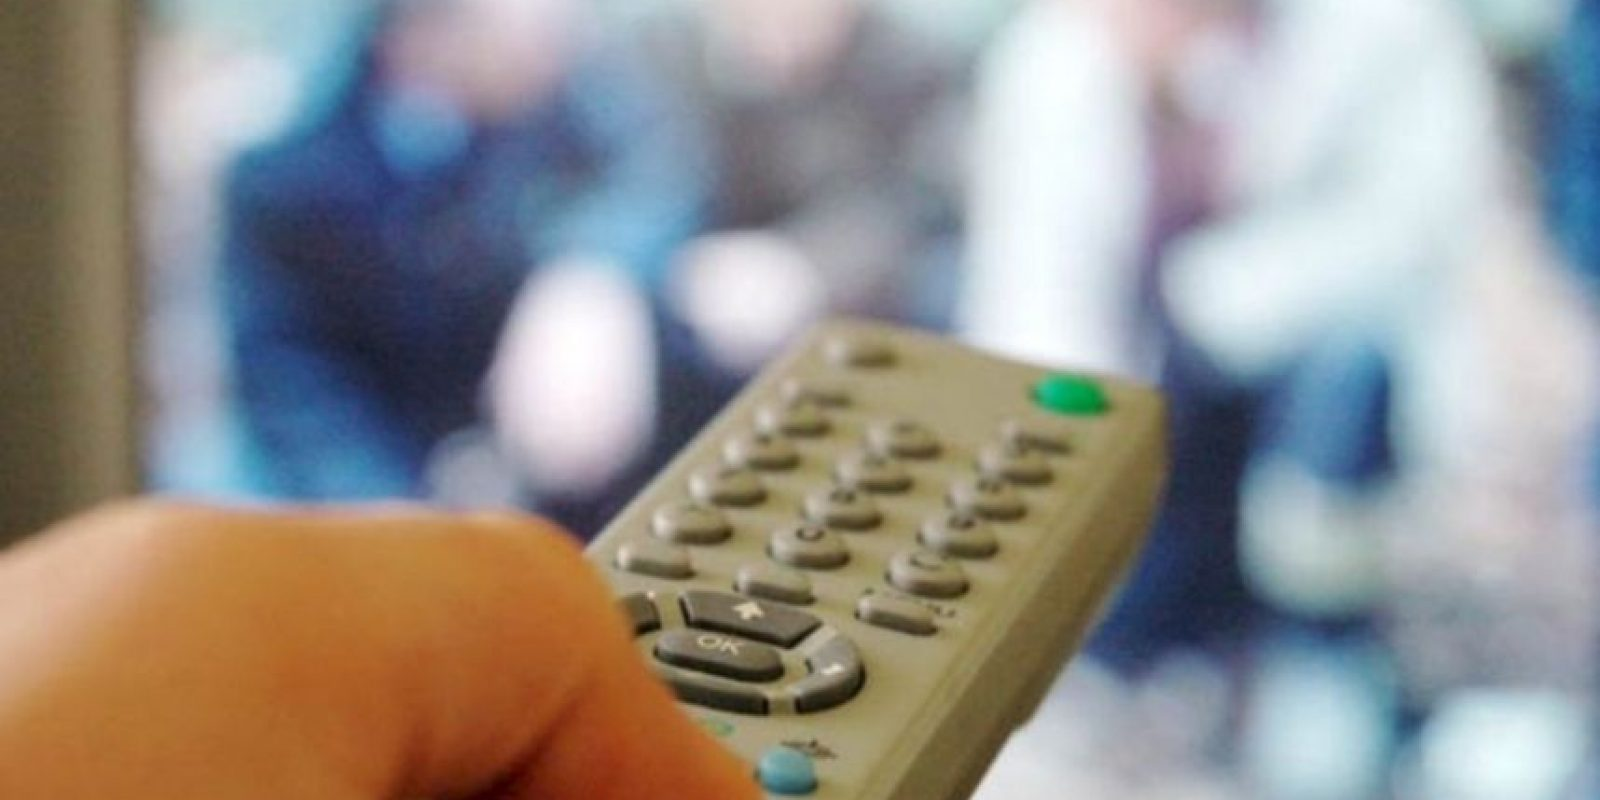 12. Un control remoto. En promedio miden 20 cms (7 pulgadas) Foto:Wikimedia